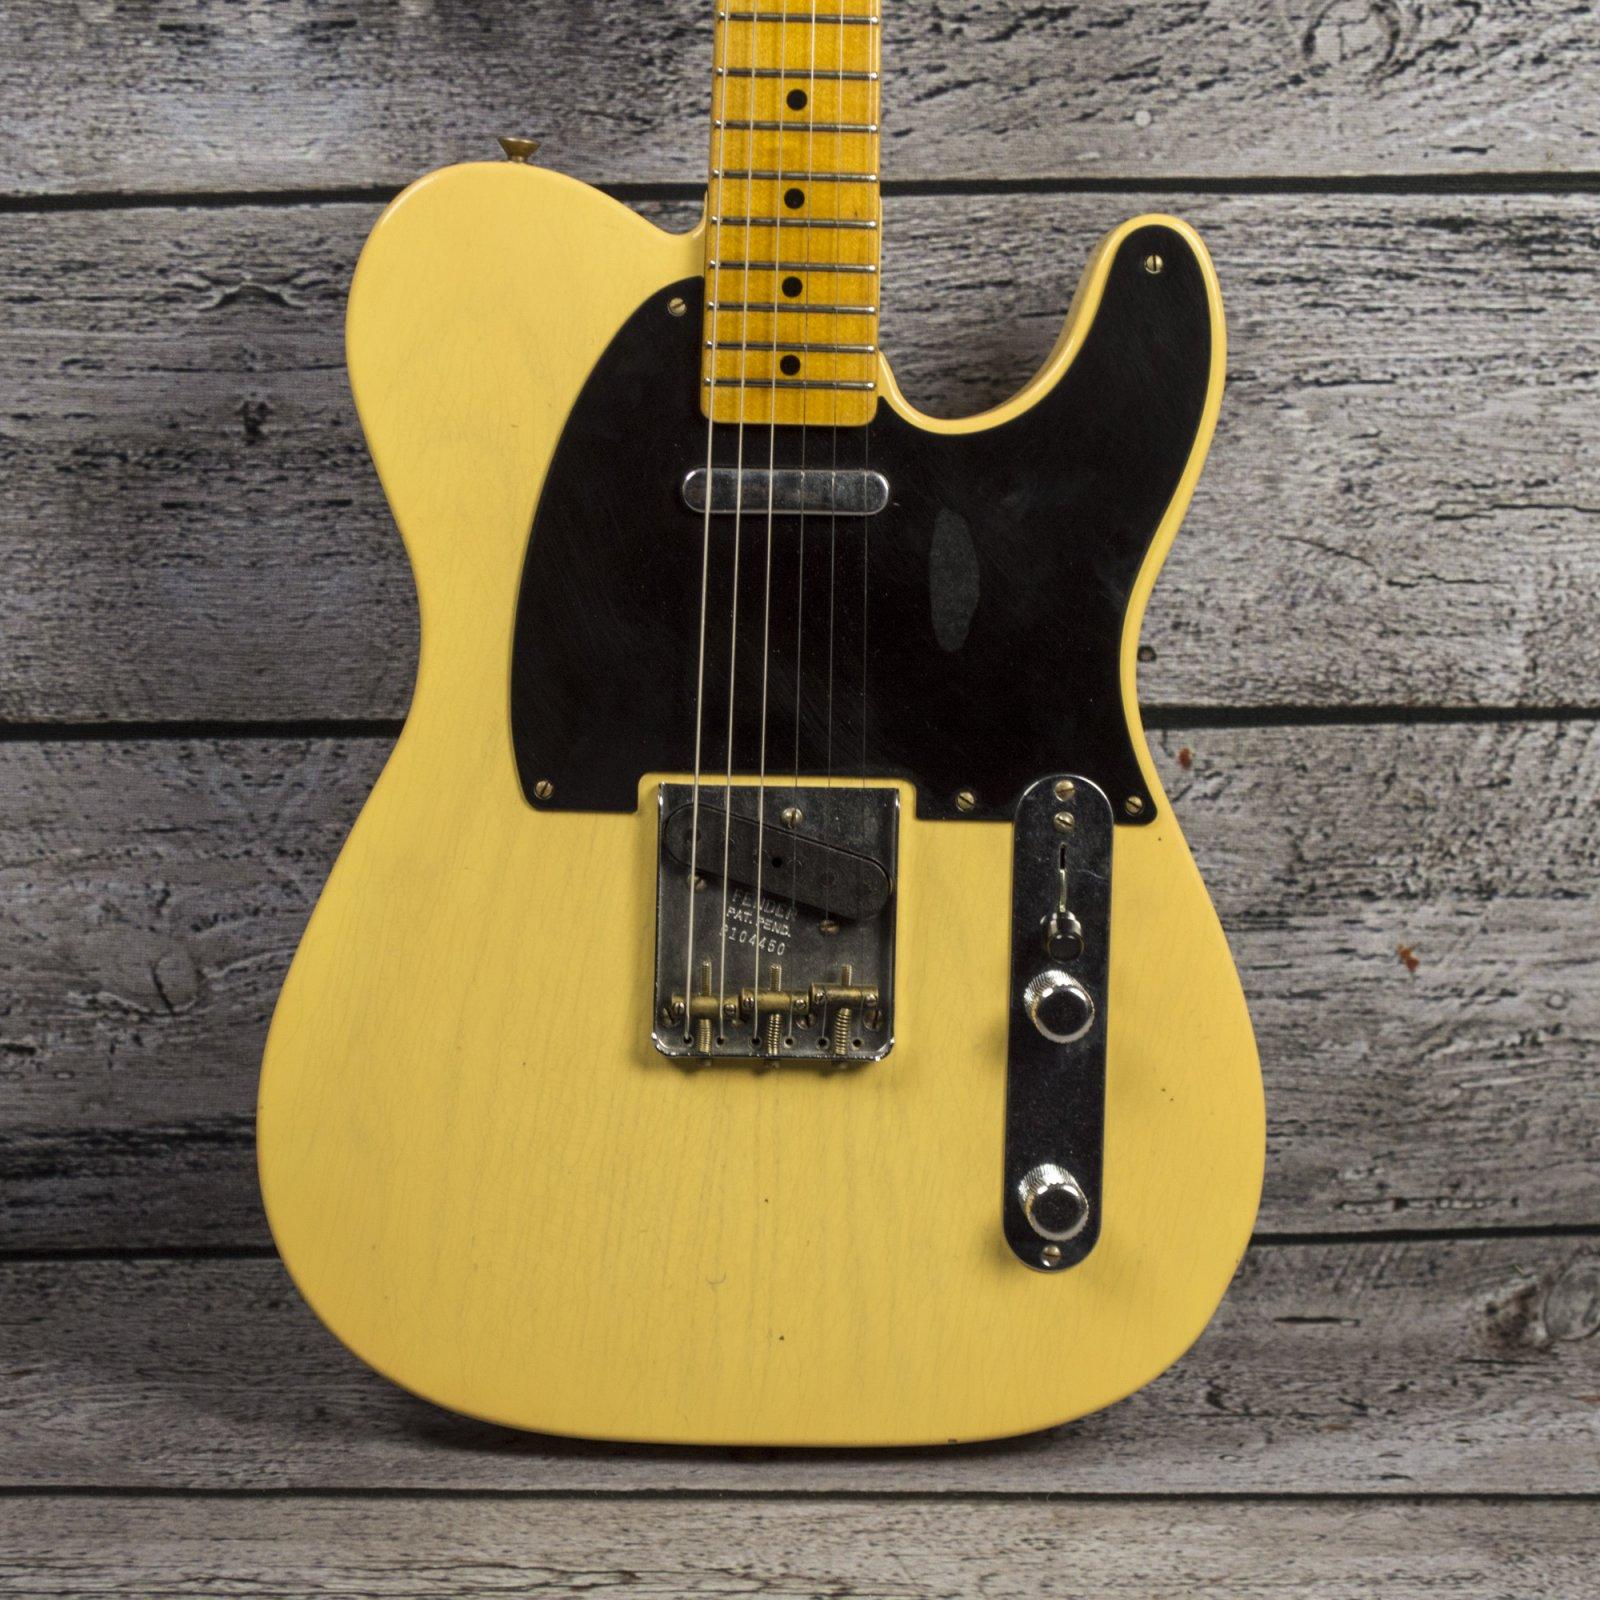 Fender Custom Shop Limited Edition 70th Anniversary Broadcaster Journeyman Relic